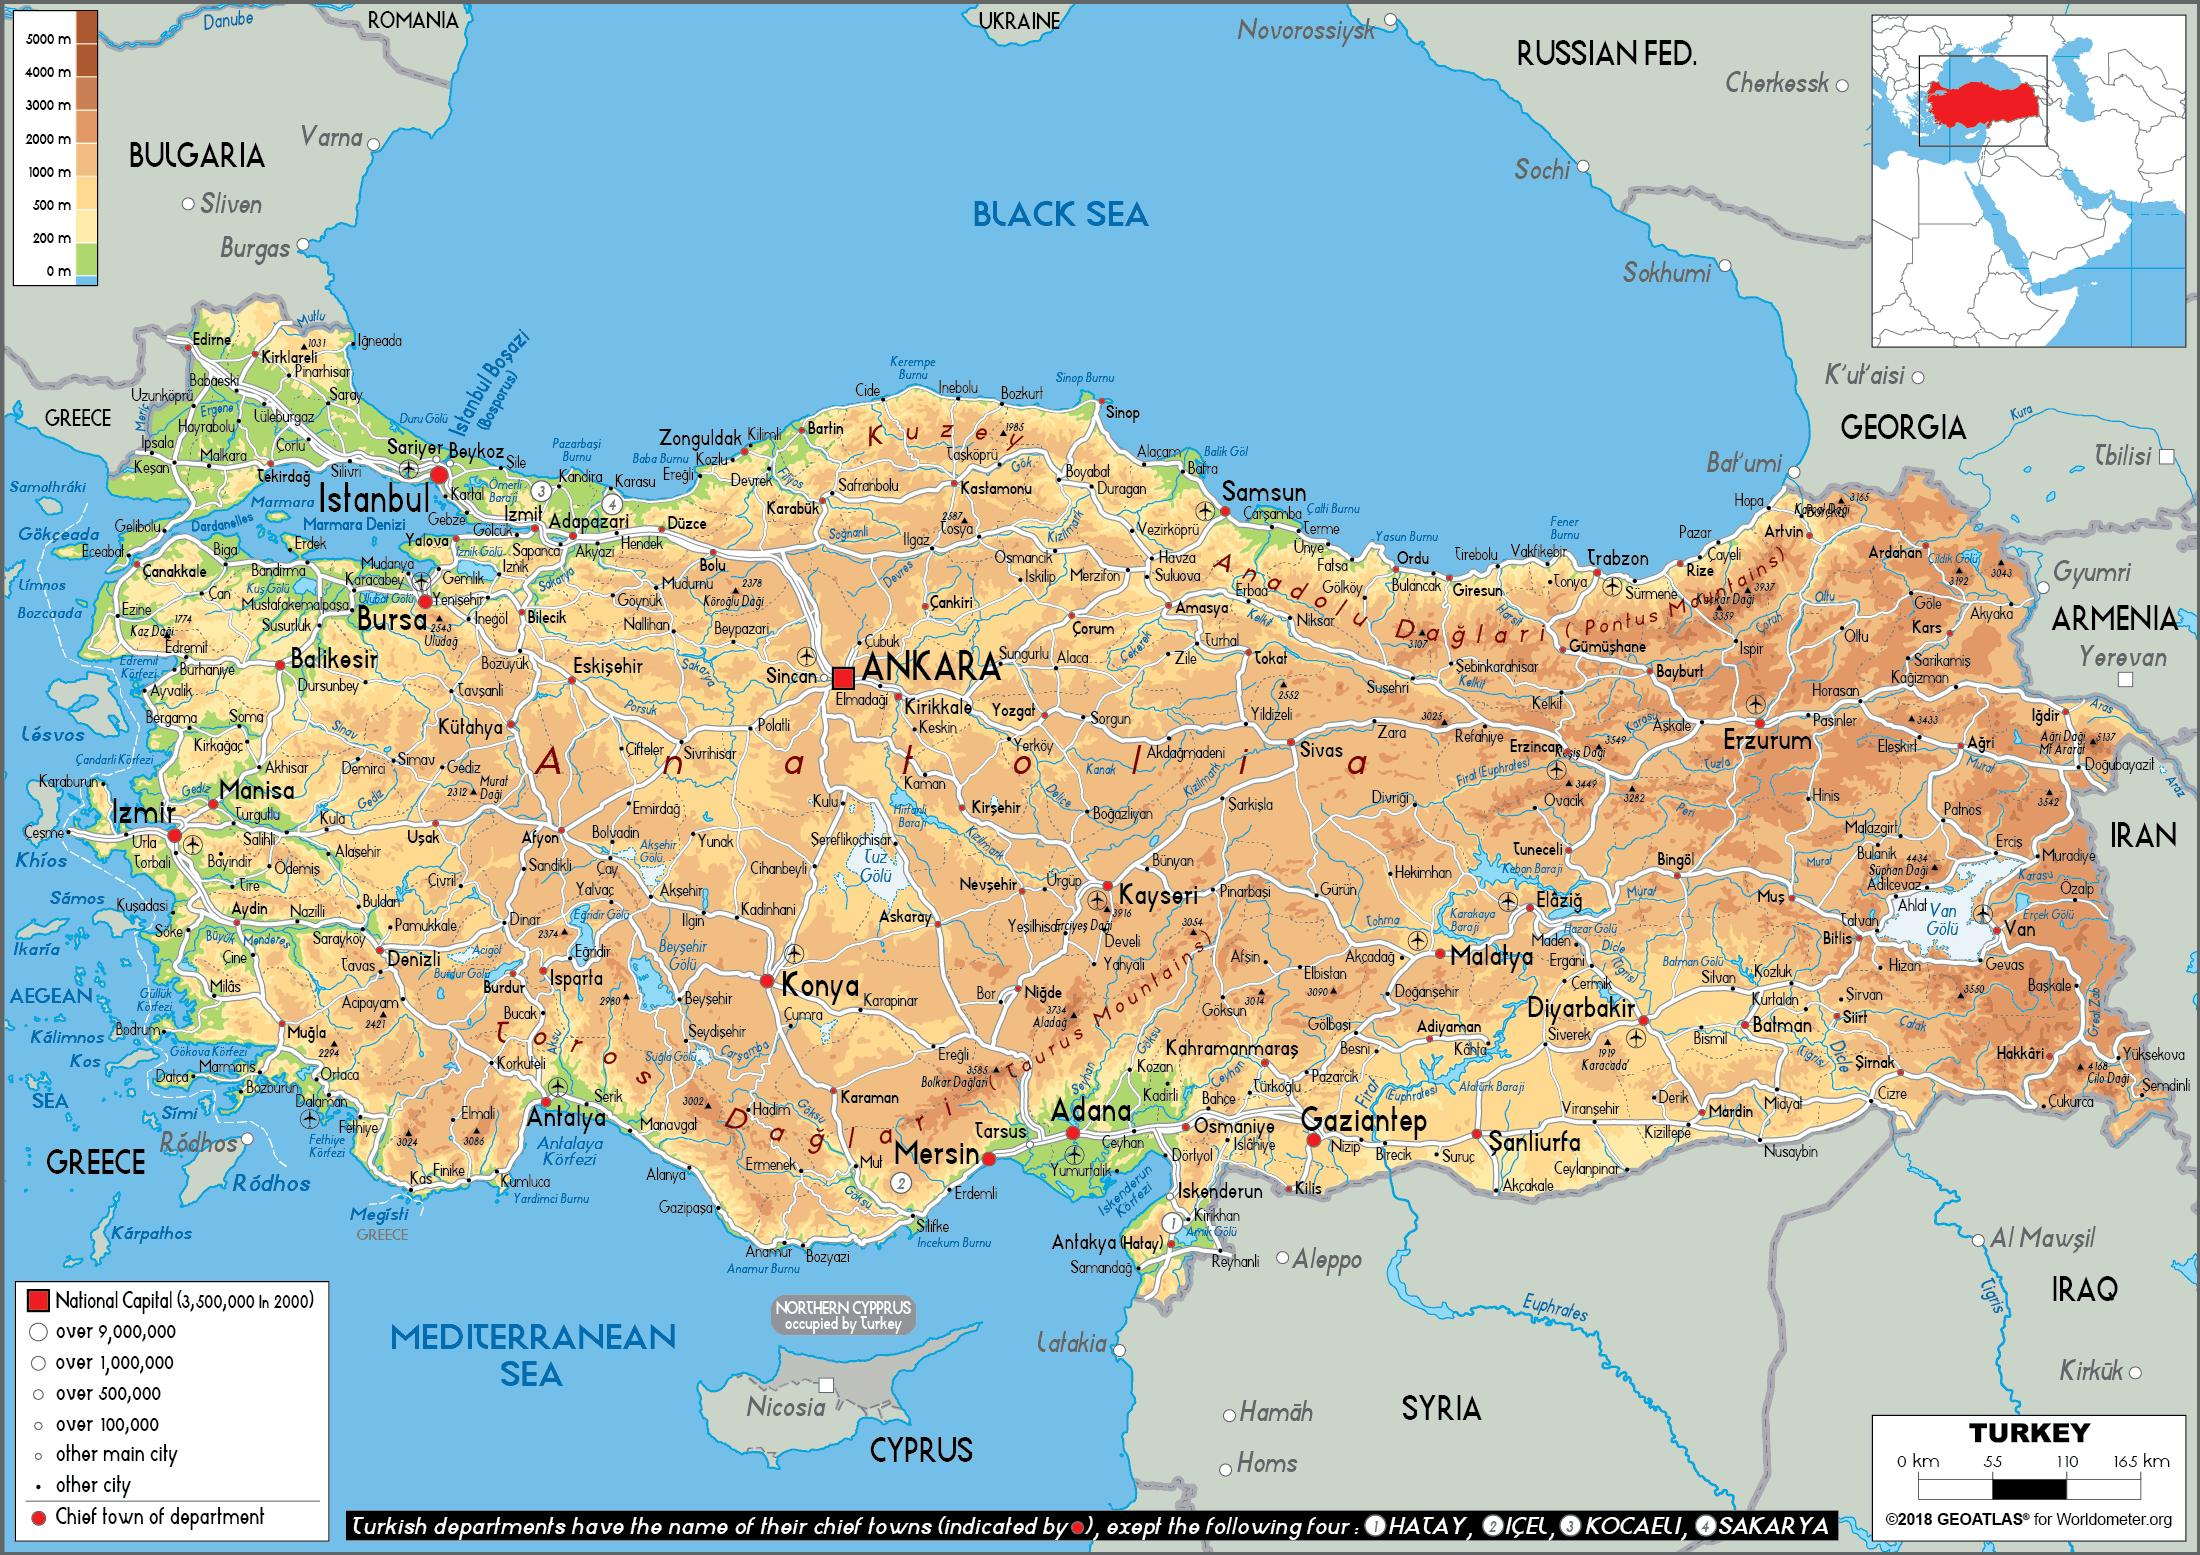 harta fizica turcia Harta fizică a Turcia   Harta Turcia fizice (Asia de Vest   Asia) harta fizica turcia